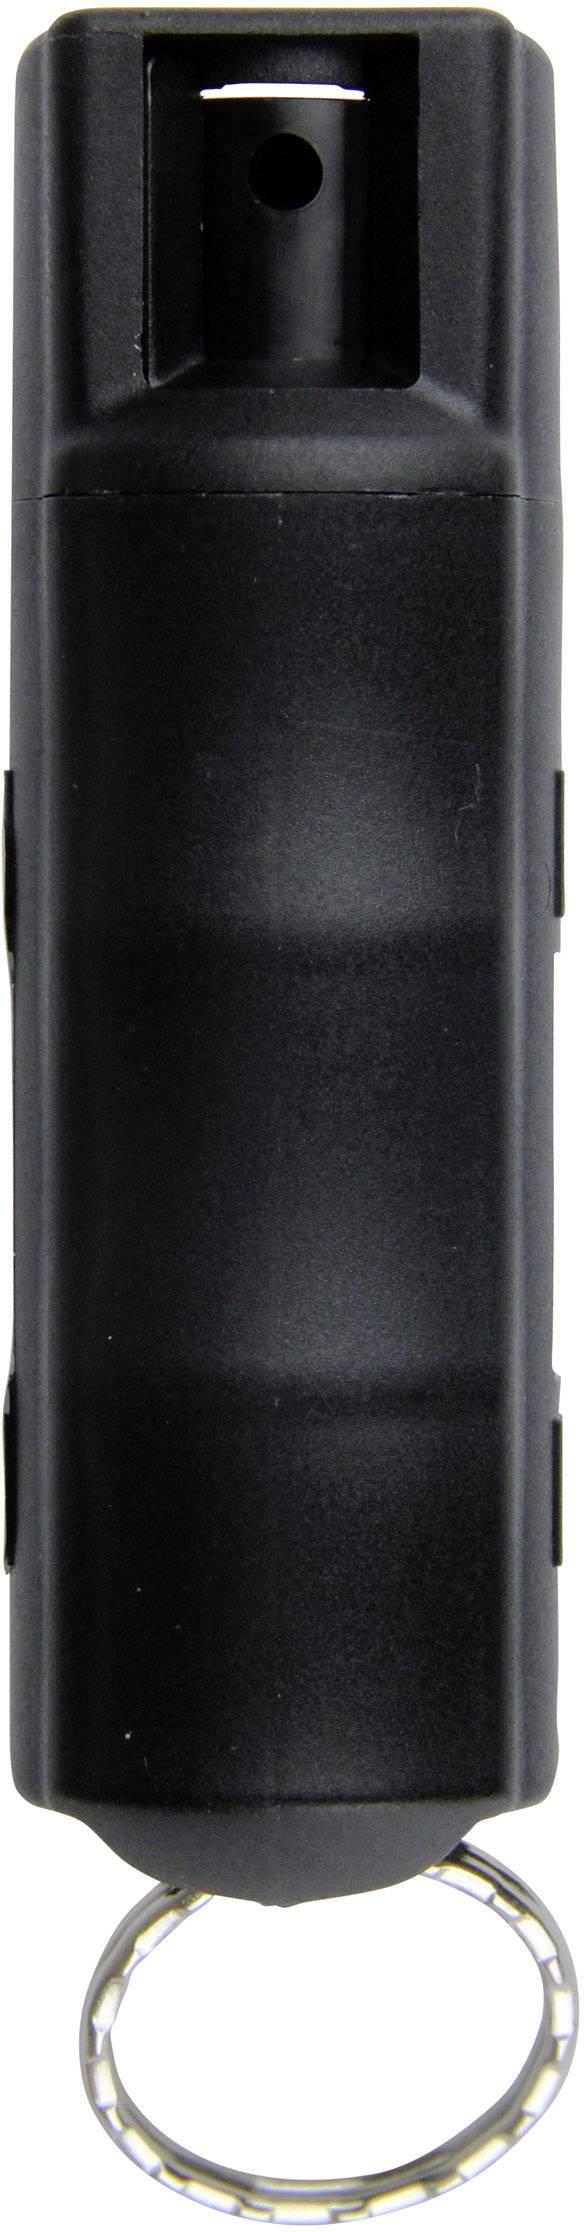 Pfefferspray 16.2 ml kh-security 130197